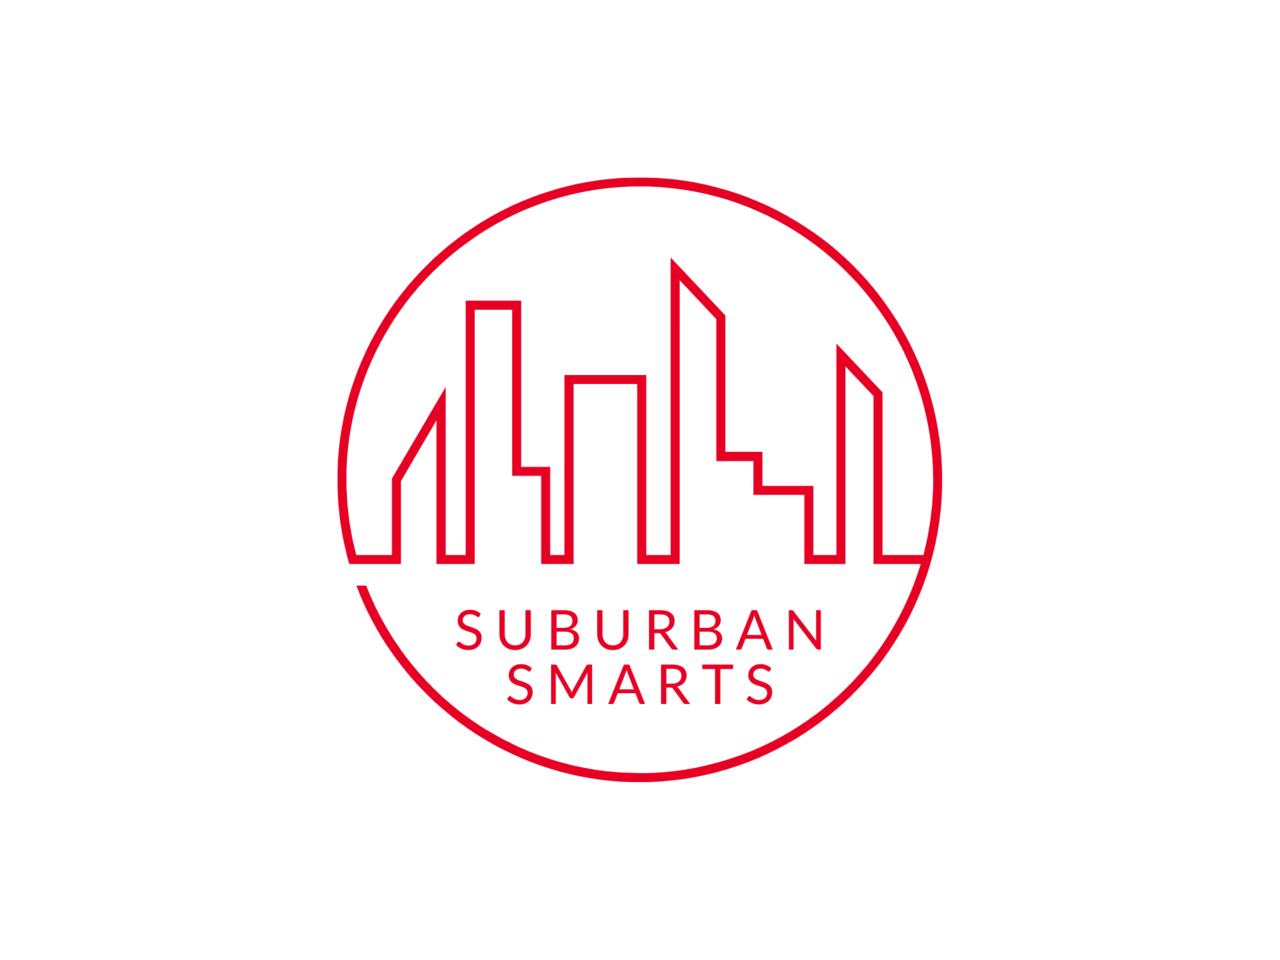 Suburban Smarts